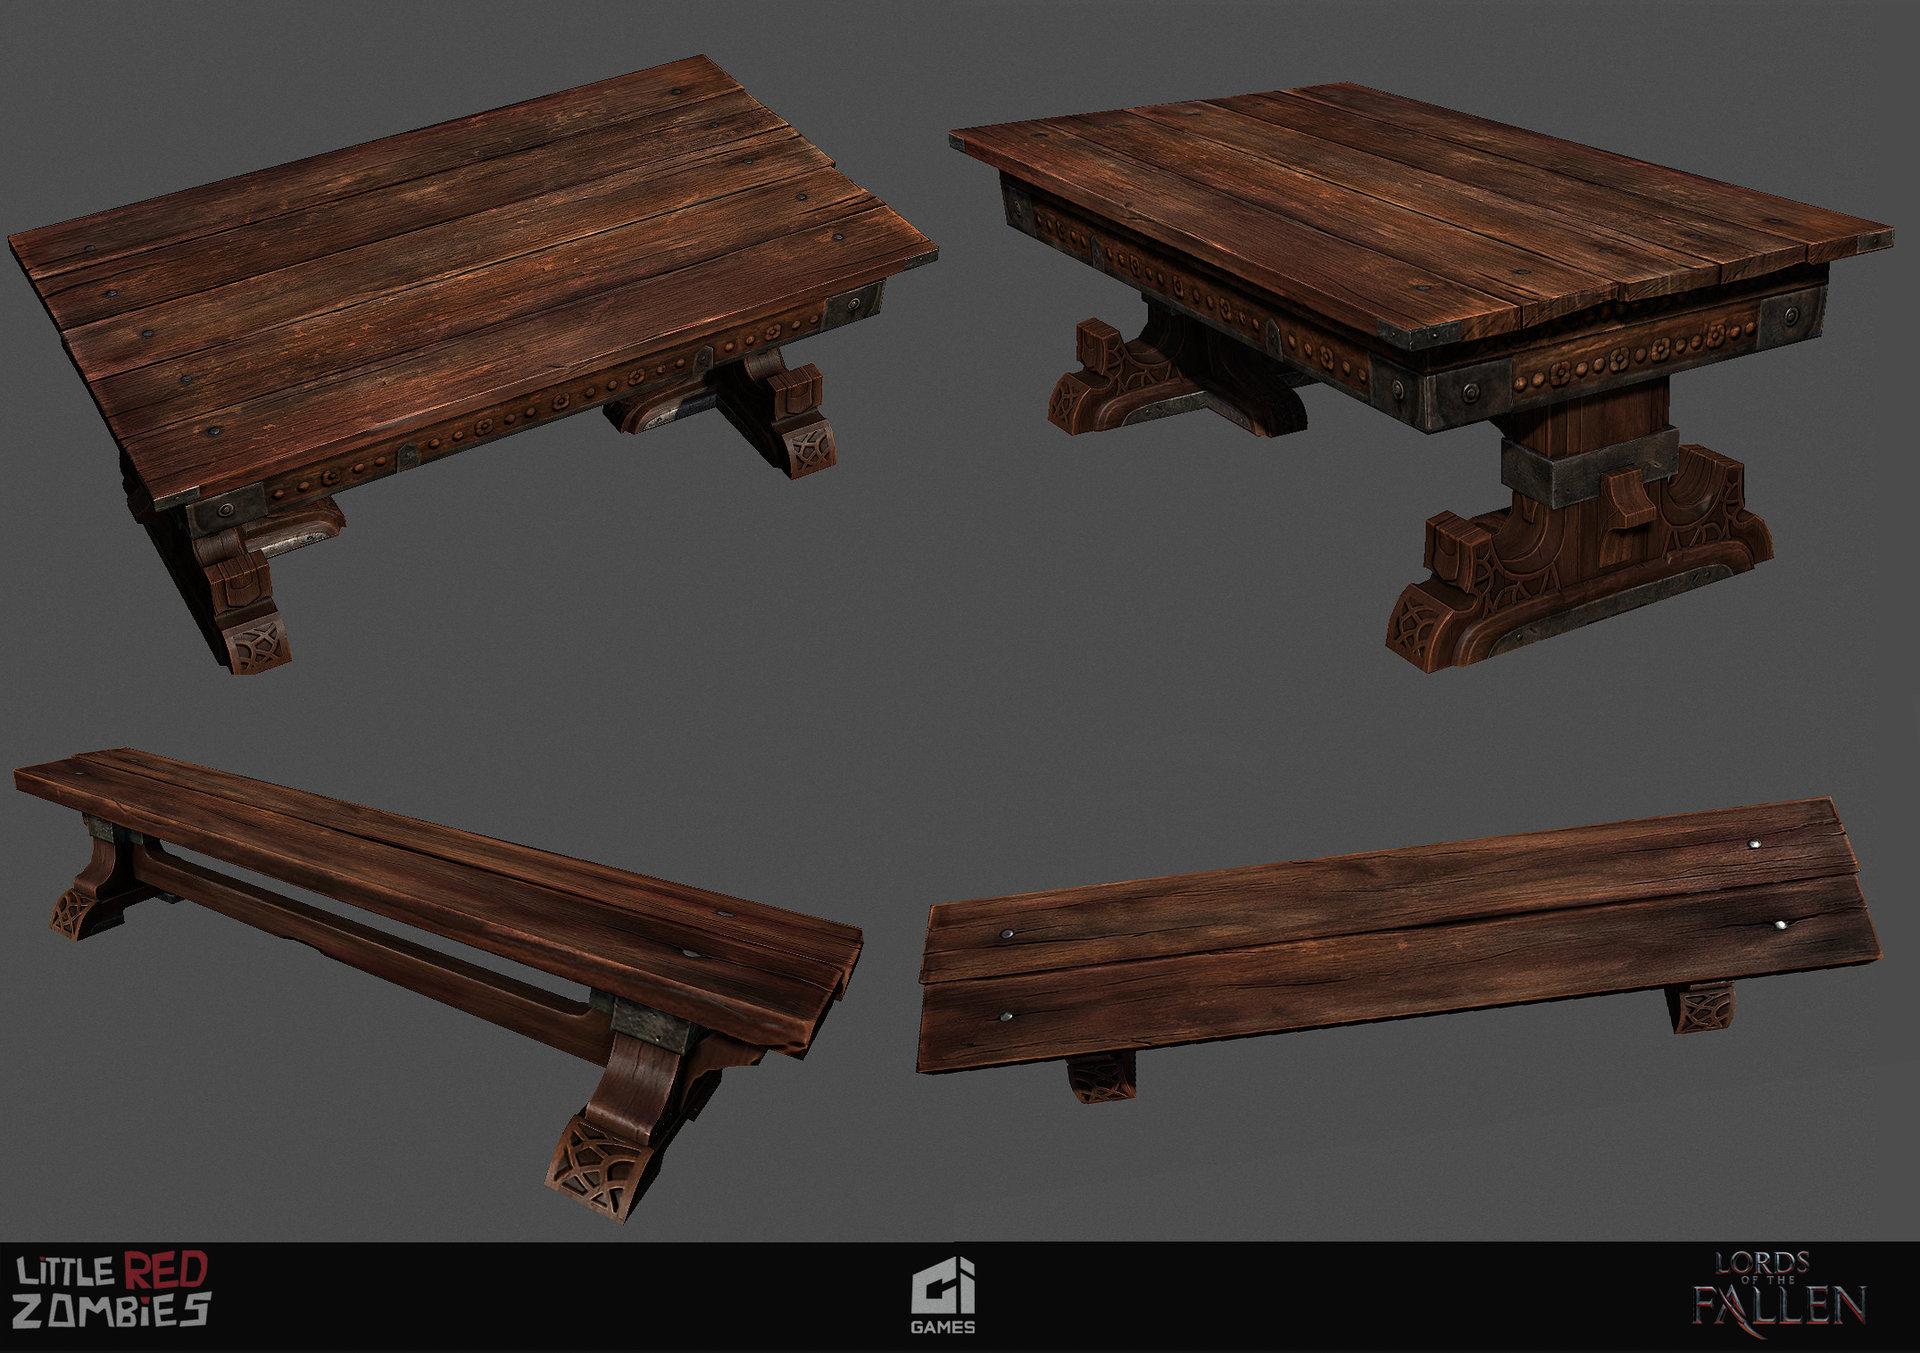 Vimal kerketta wood asset lotf highpoly